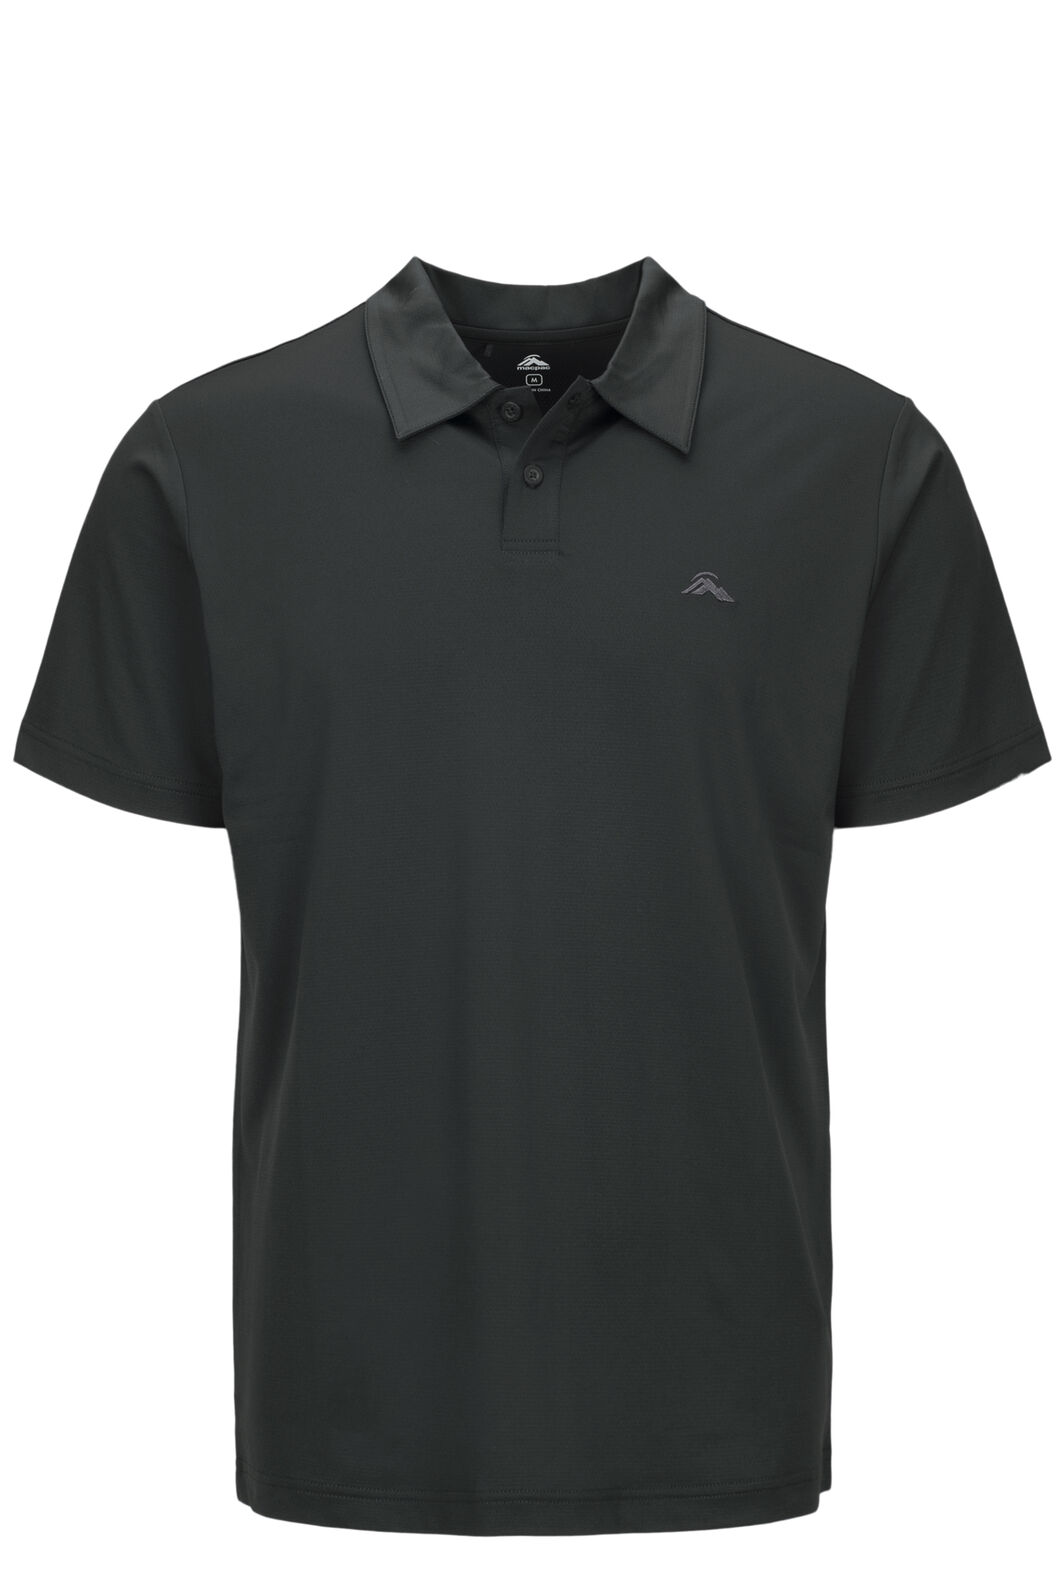 Macpac Eyre Short Sleeve Polo — Men's, True Black, hi-res